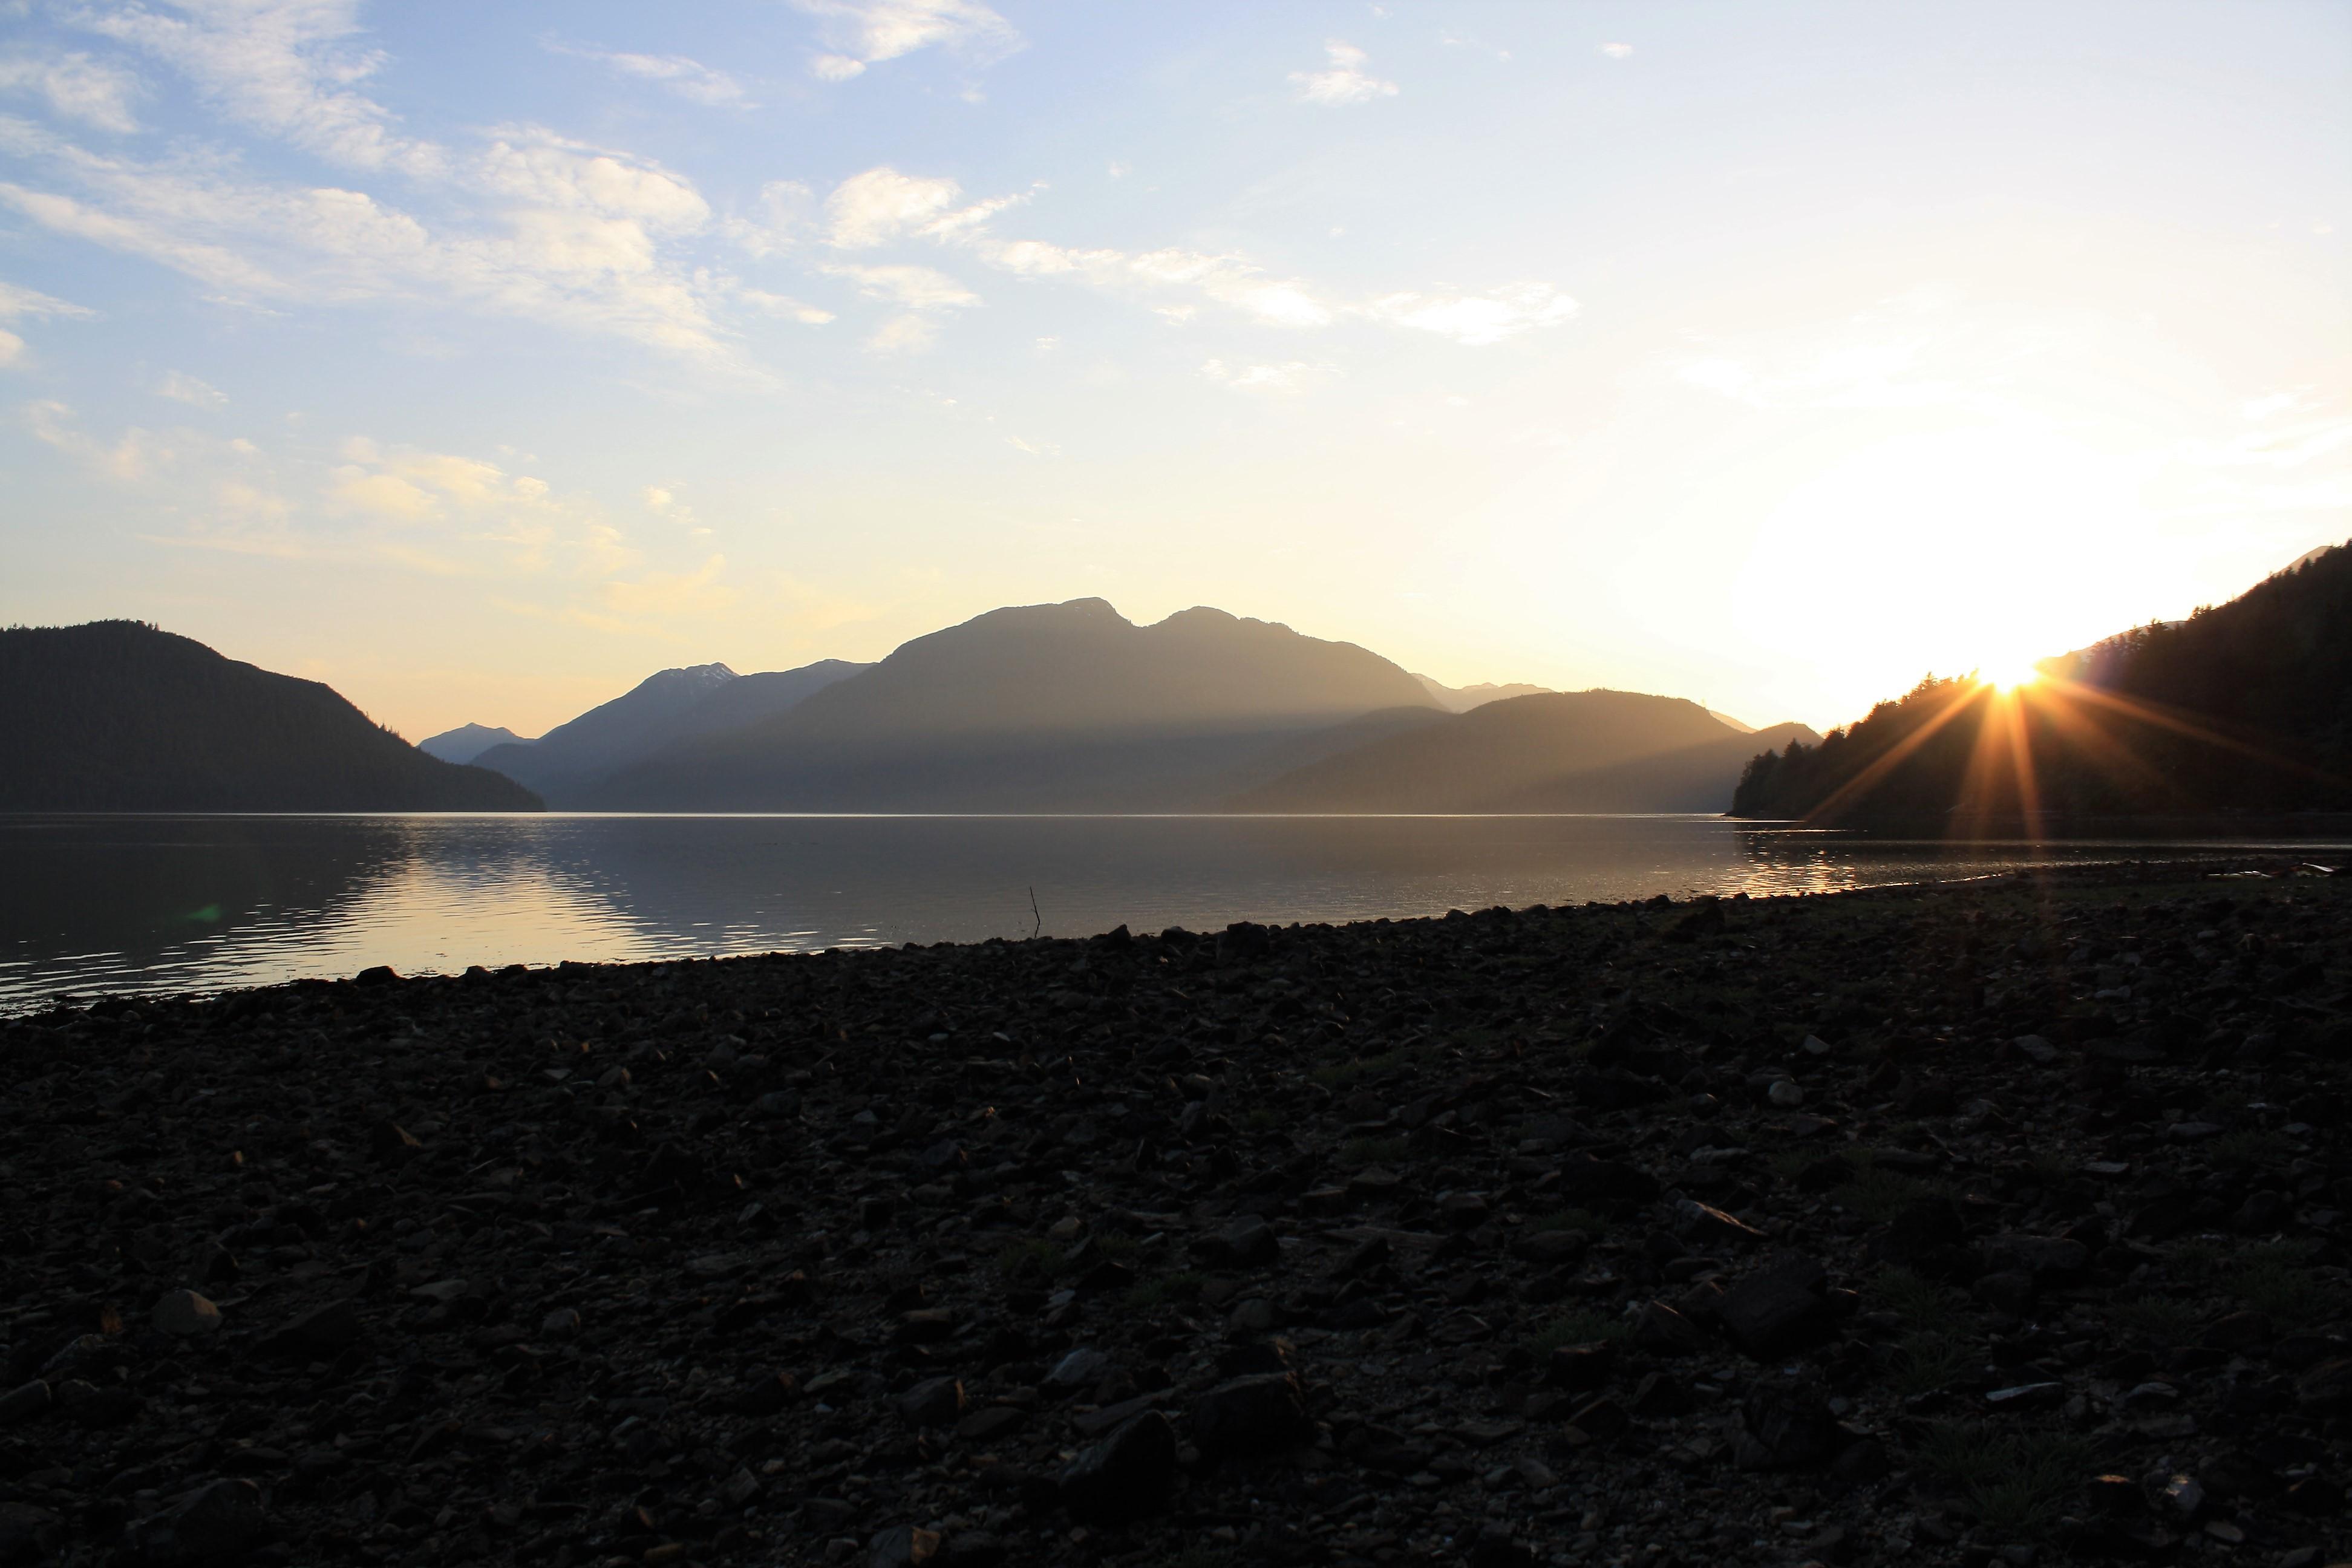 DM_nature_sunsetssunrises_haidagwaii_595